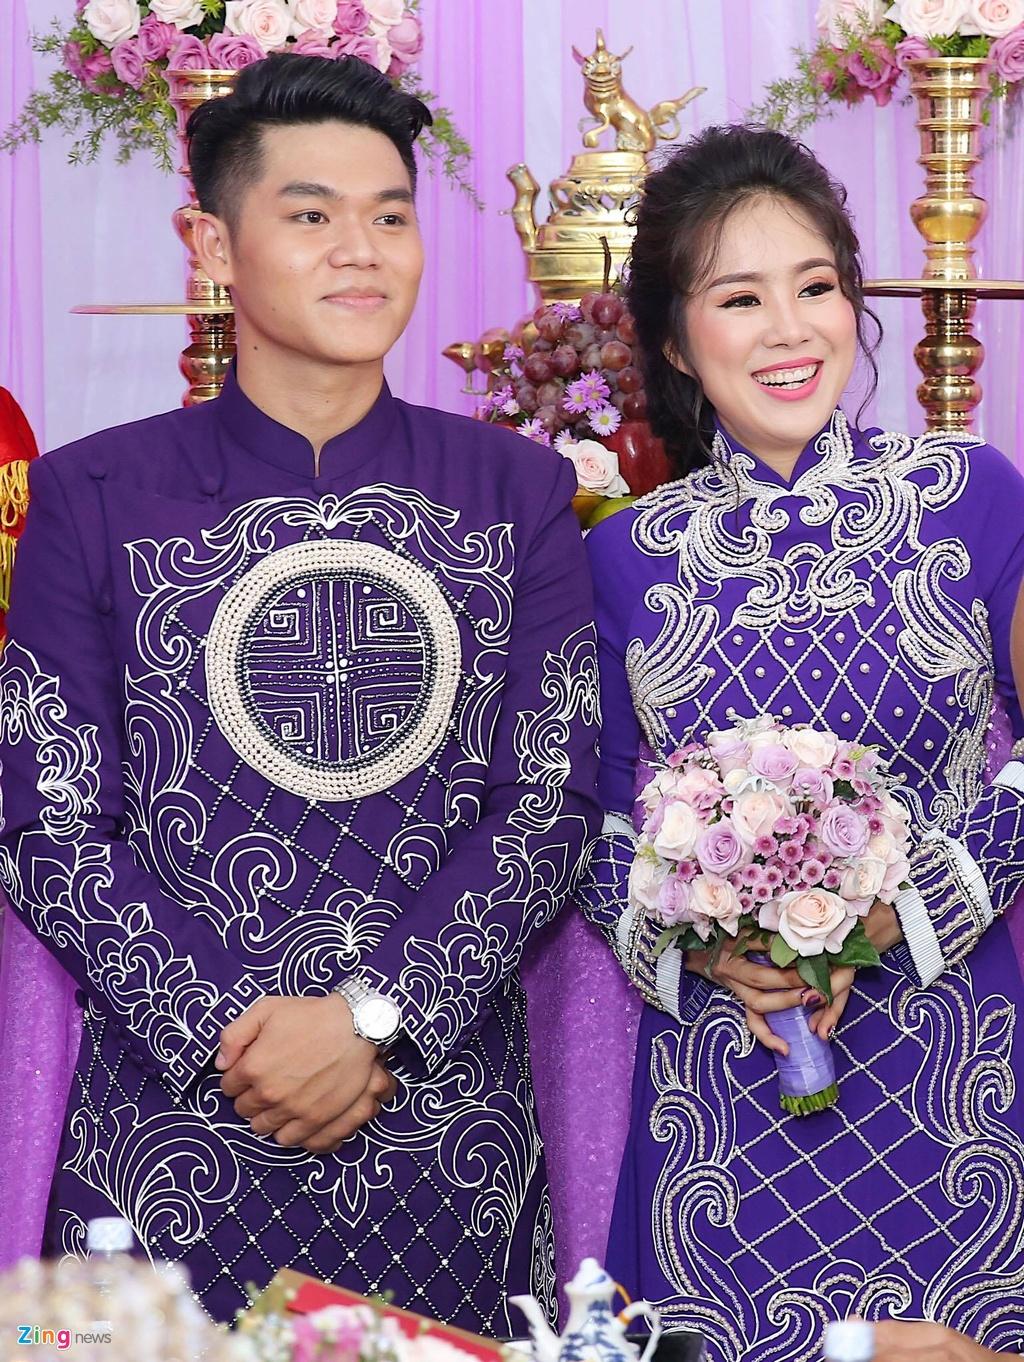 Le Phuong rang ngoi trong le cuoi lan hai o Tra Vinh hinh anh 9